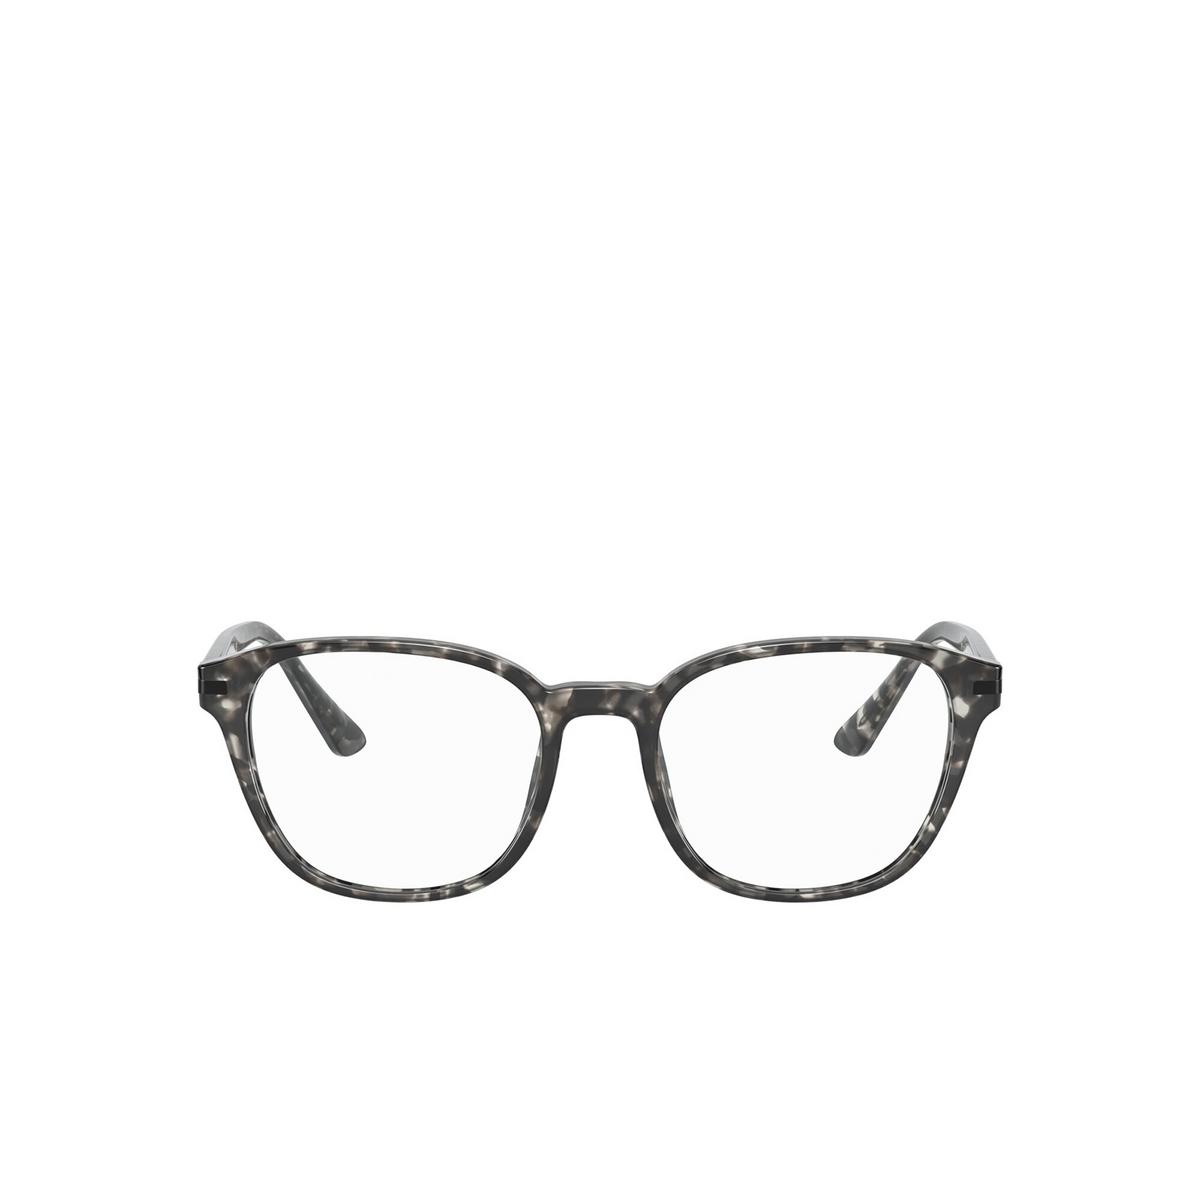 Prada® Square Eyeglasses: PR 12WV color Matte Grey Tortoise VH31O1 - front view.